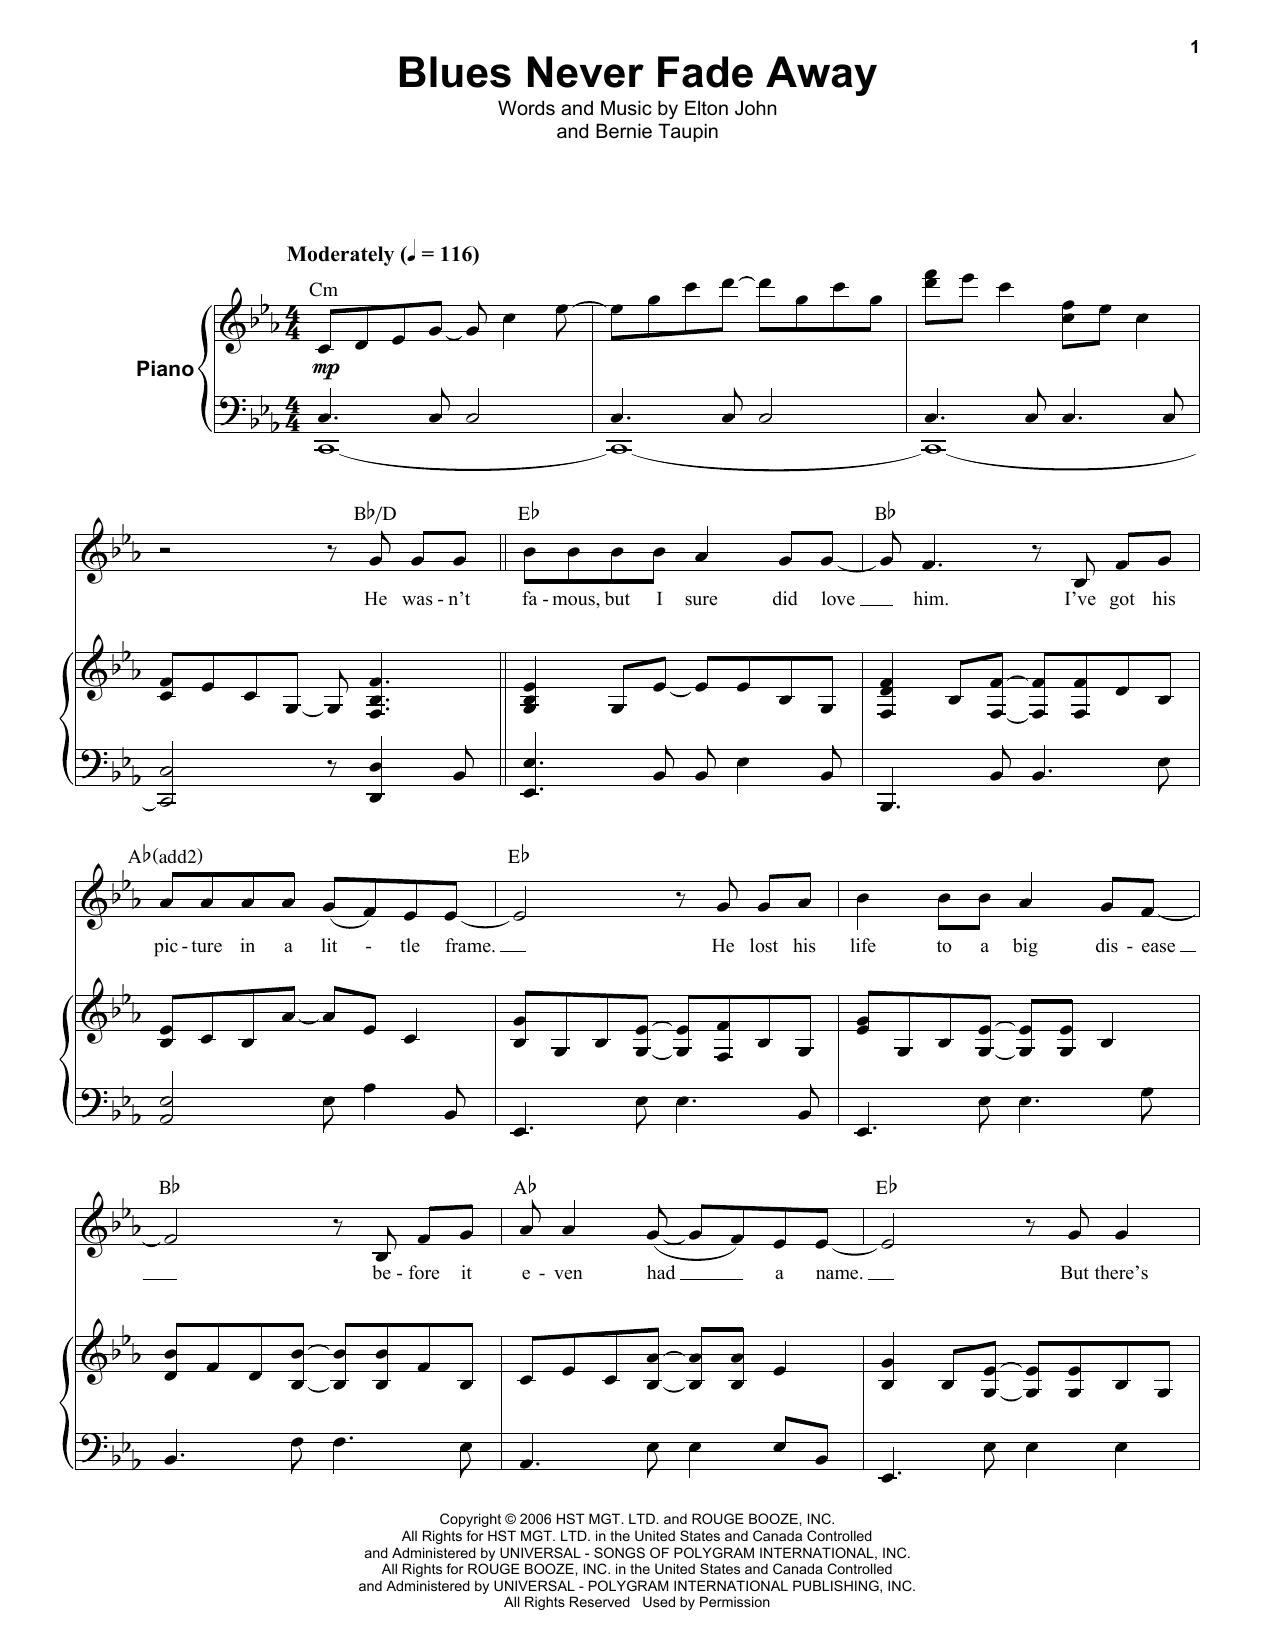 Elton John Blues Never Fade Away Sheet Music Notes Chords